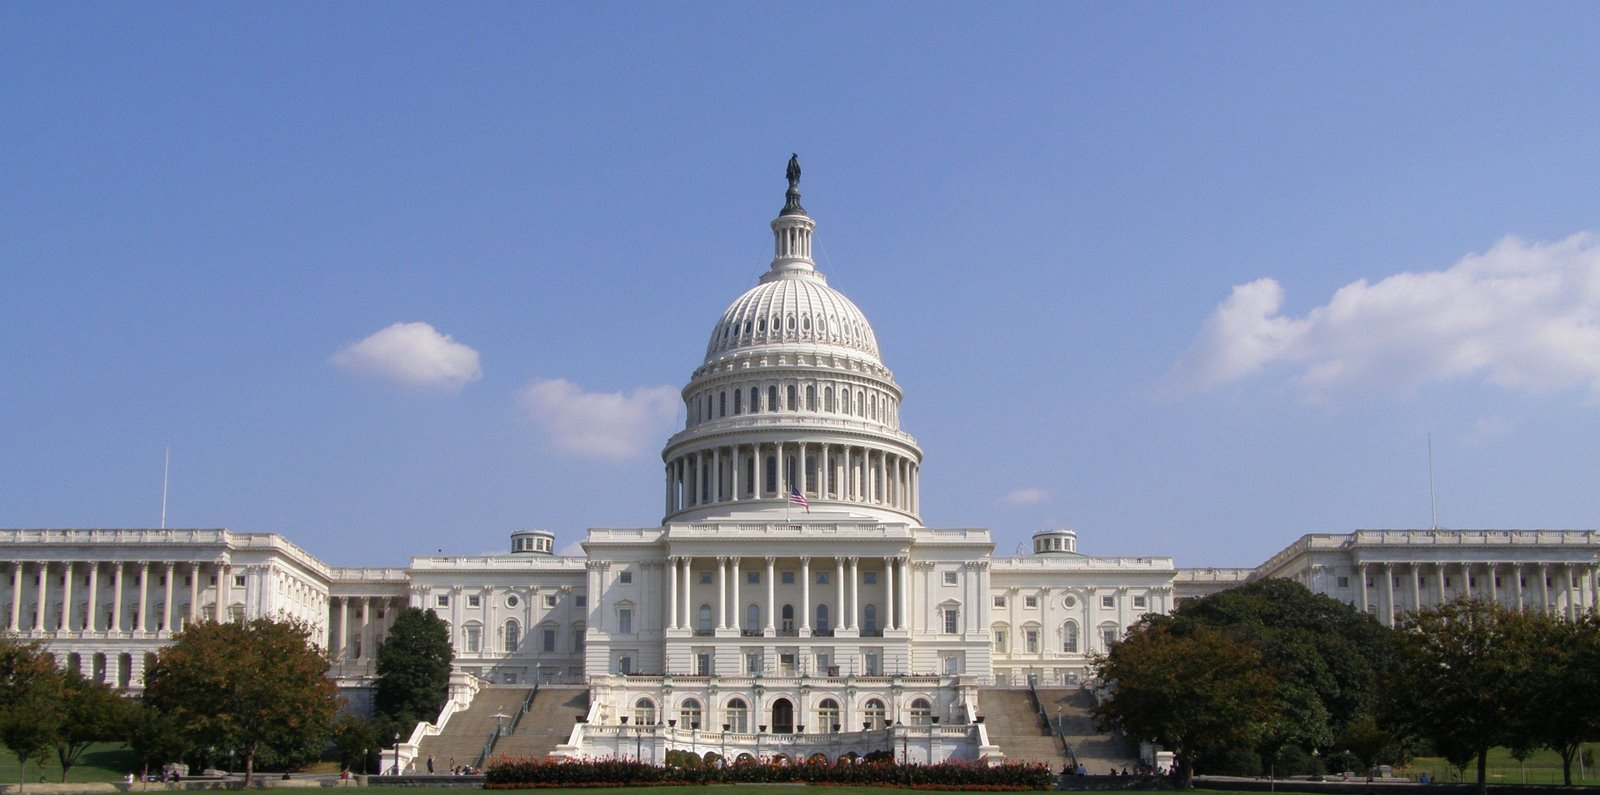 United States Capitol, national capital